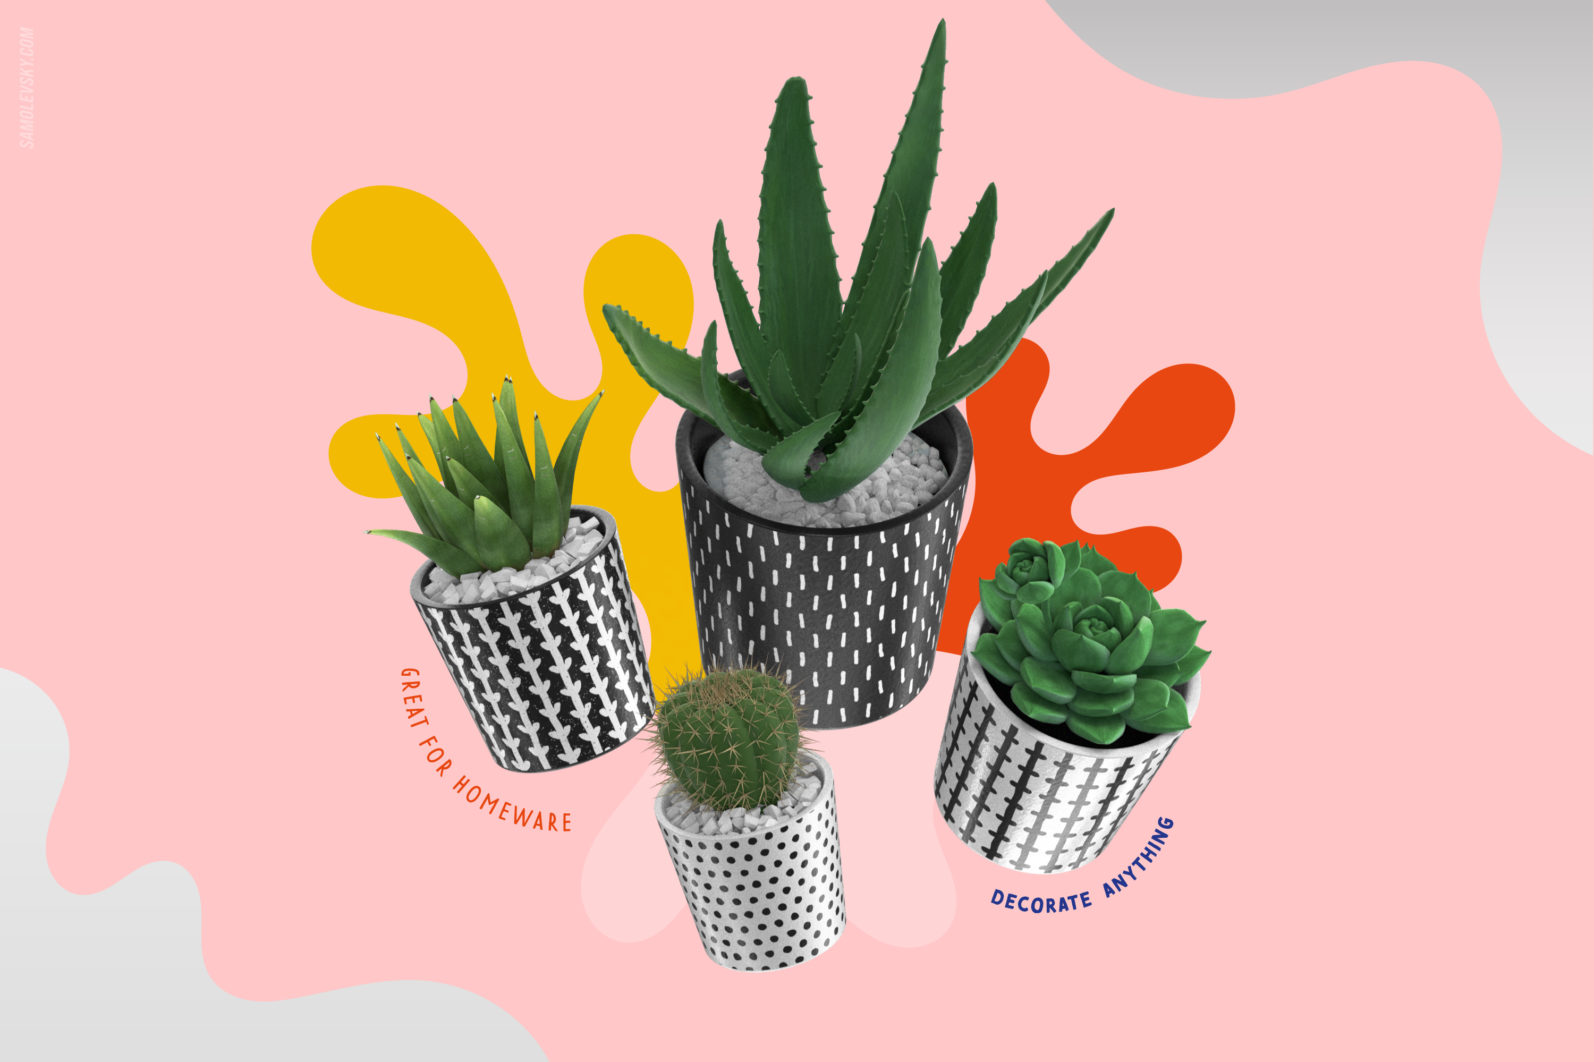 Handmade patterns bundle - 300 seamless patterns, brushes, and shapes - Samolevsky.com Handmade patterns bundle 23 scaled -